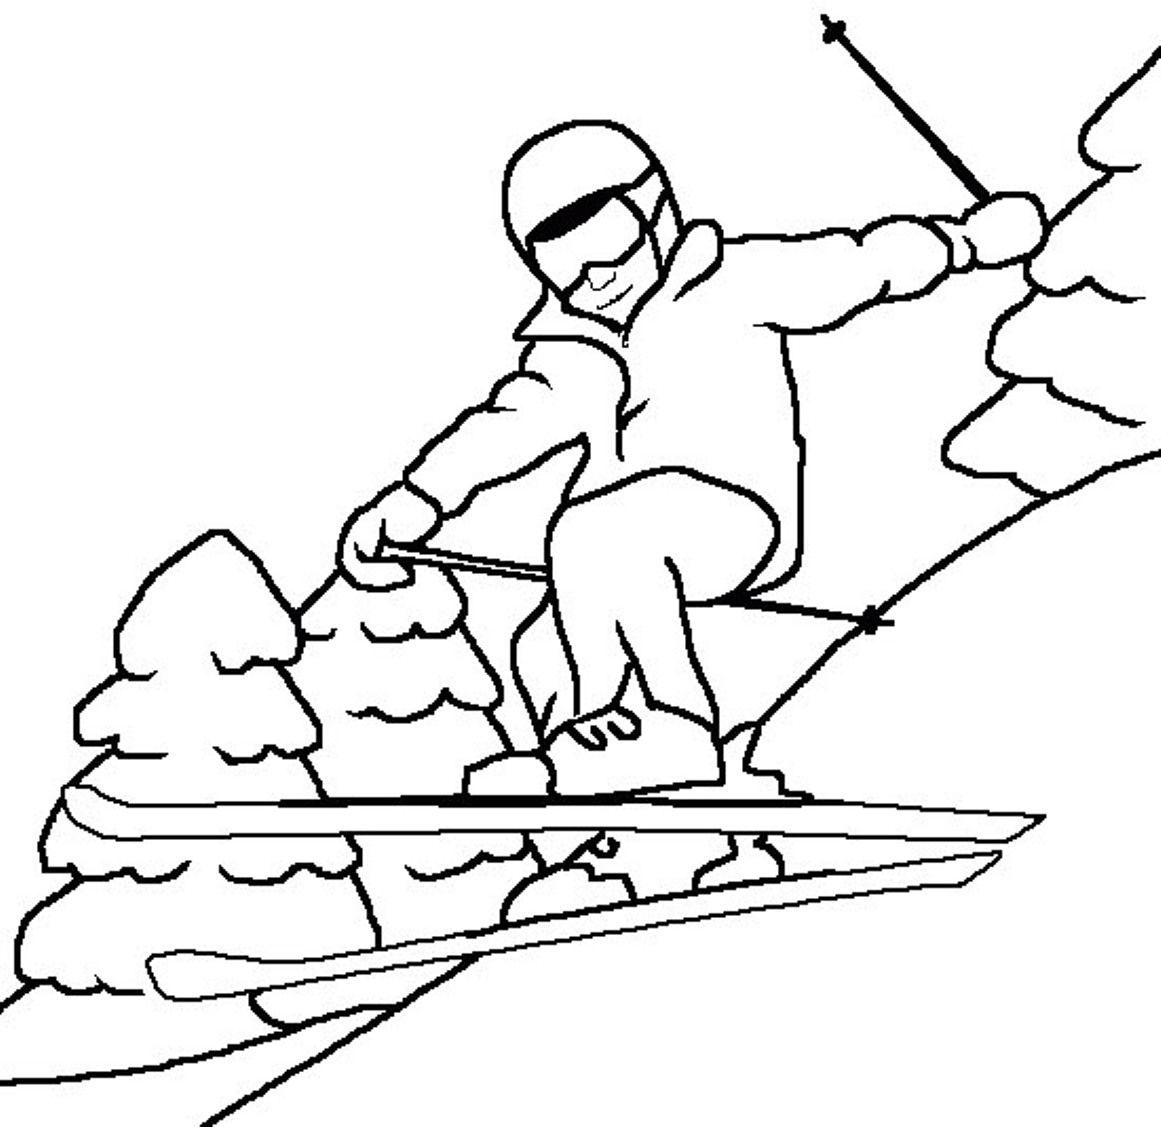 1161x1127 Winter Skiing Coloring Stitches Winter, Stitch